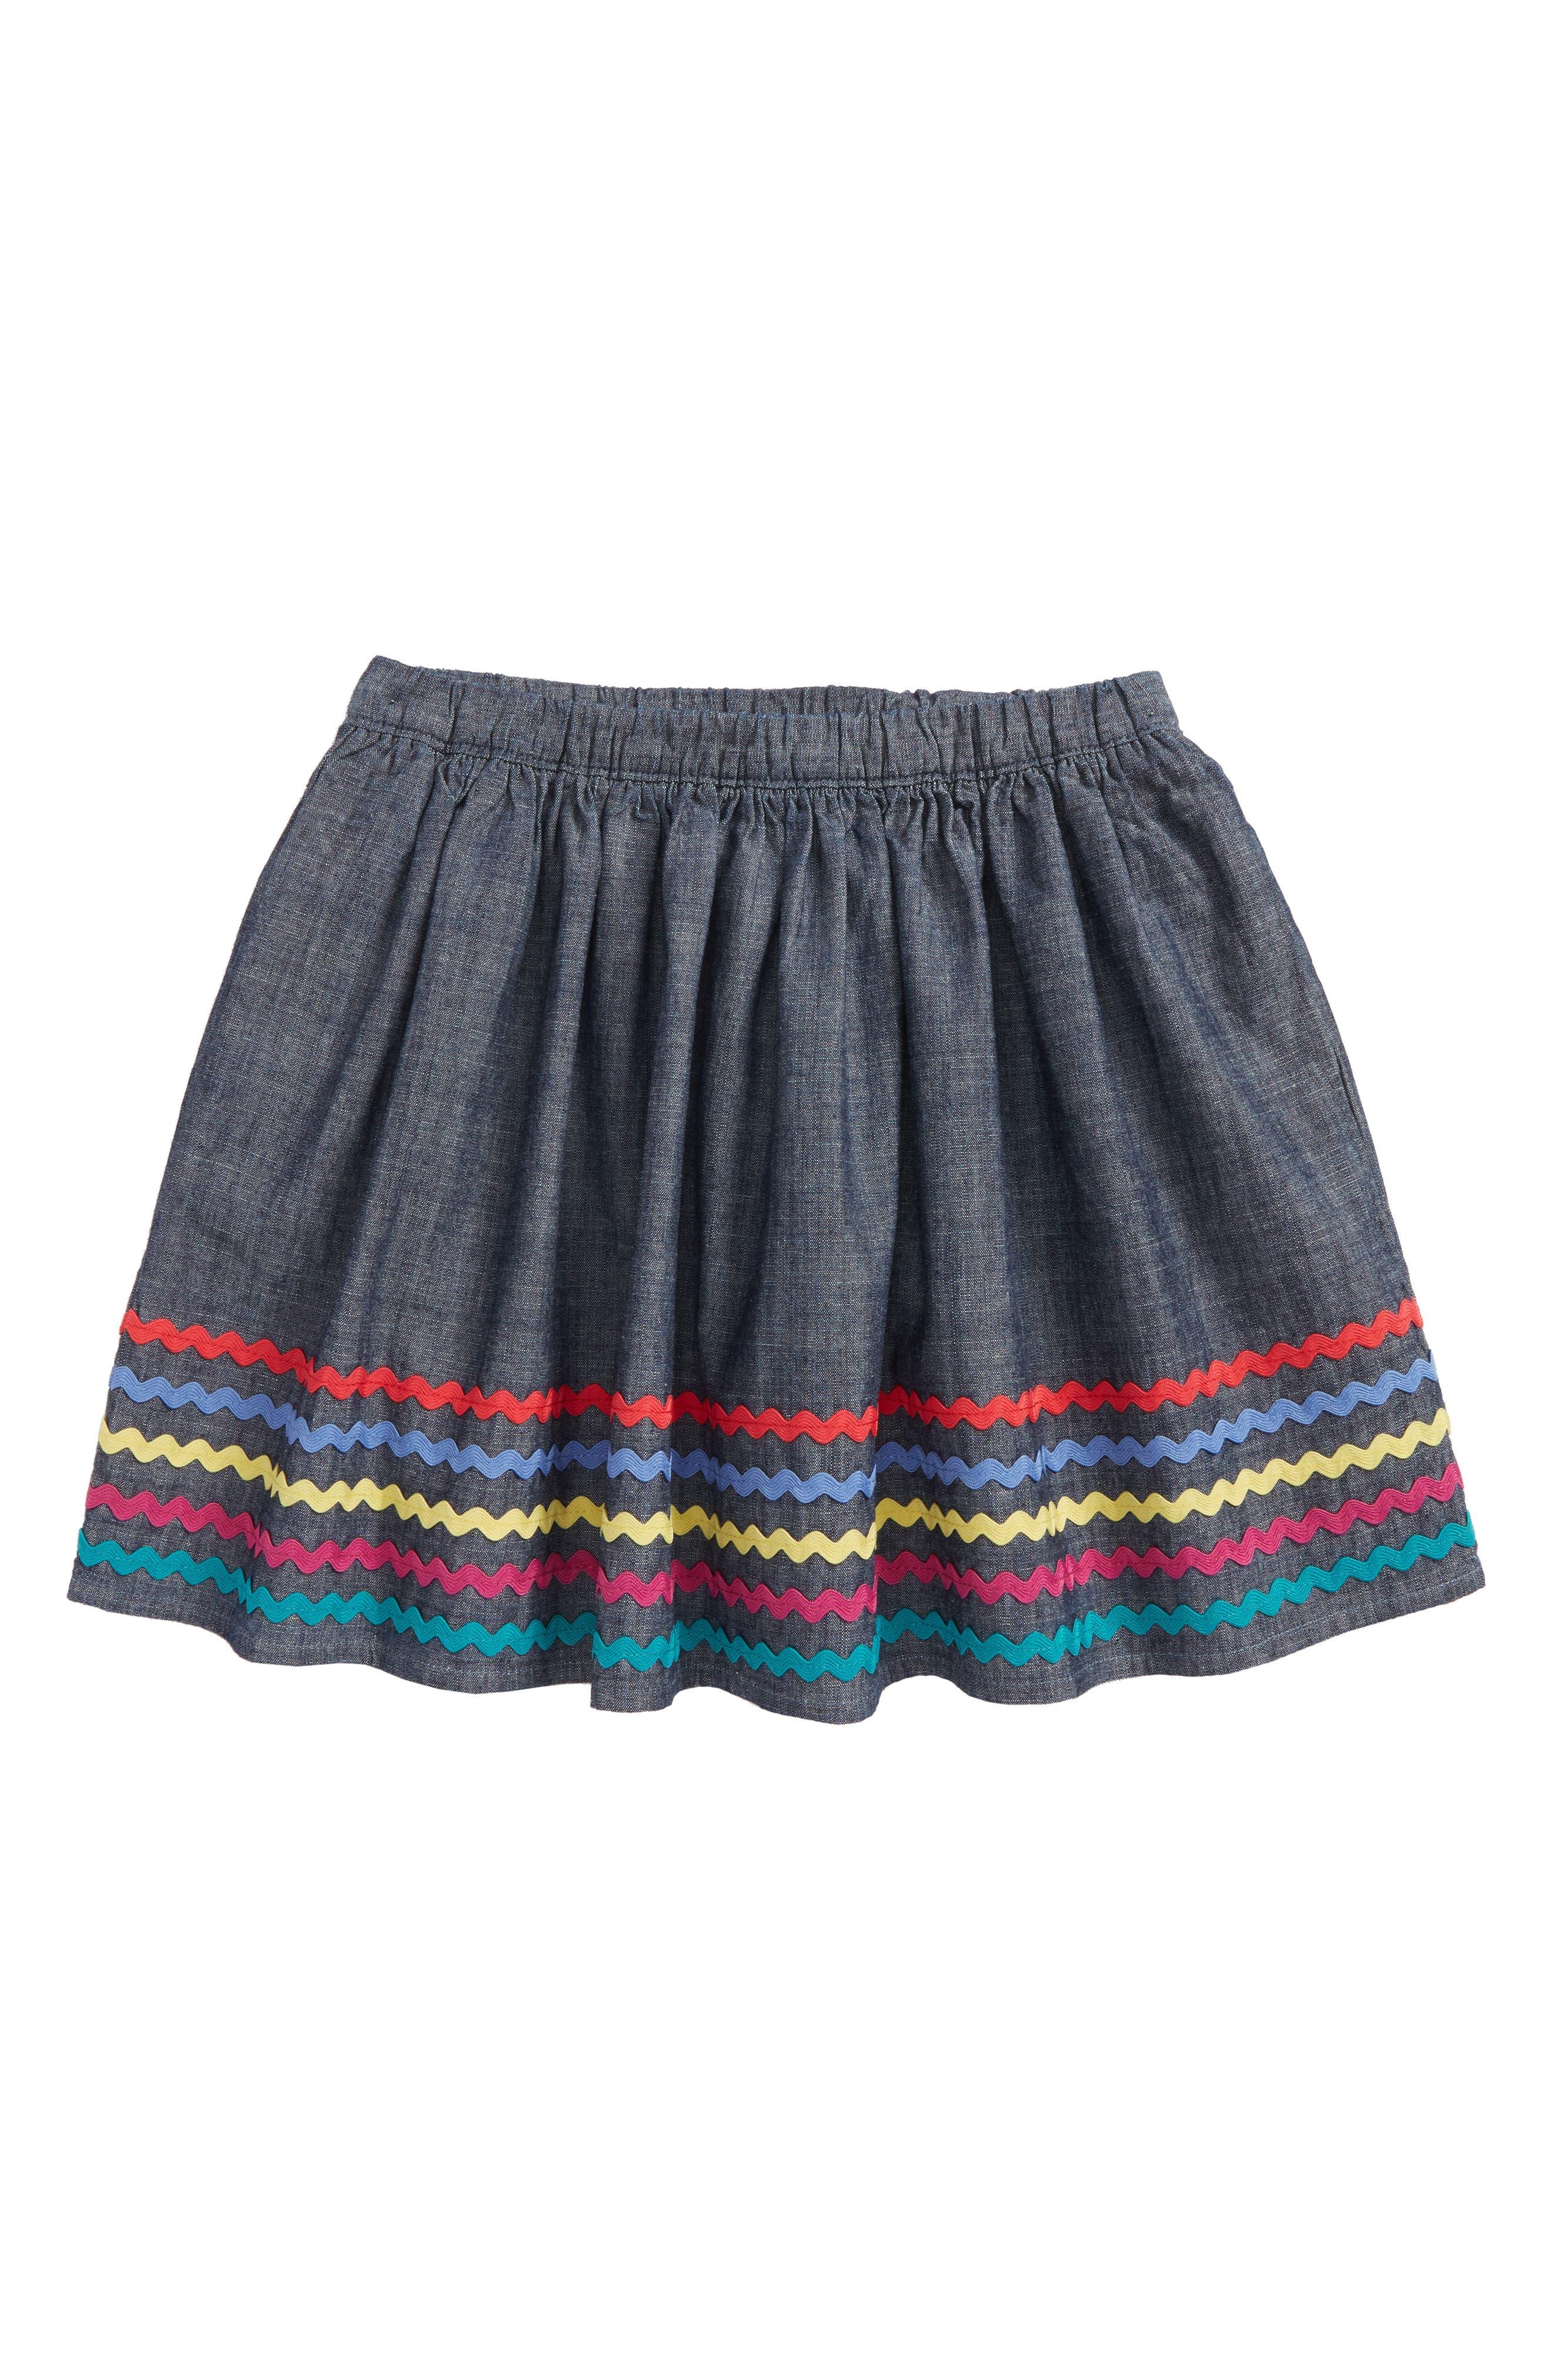 Rickrack Twirl Skirt,                             Main thumbnail 1, color,                             Blue Chambray